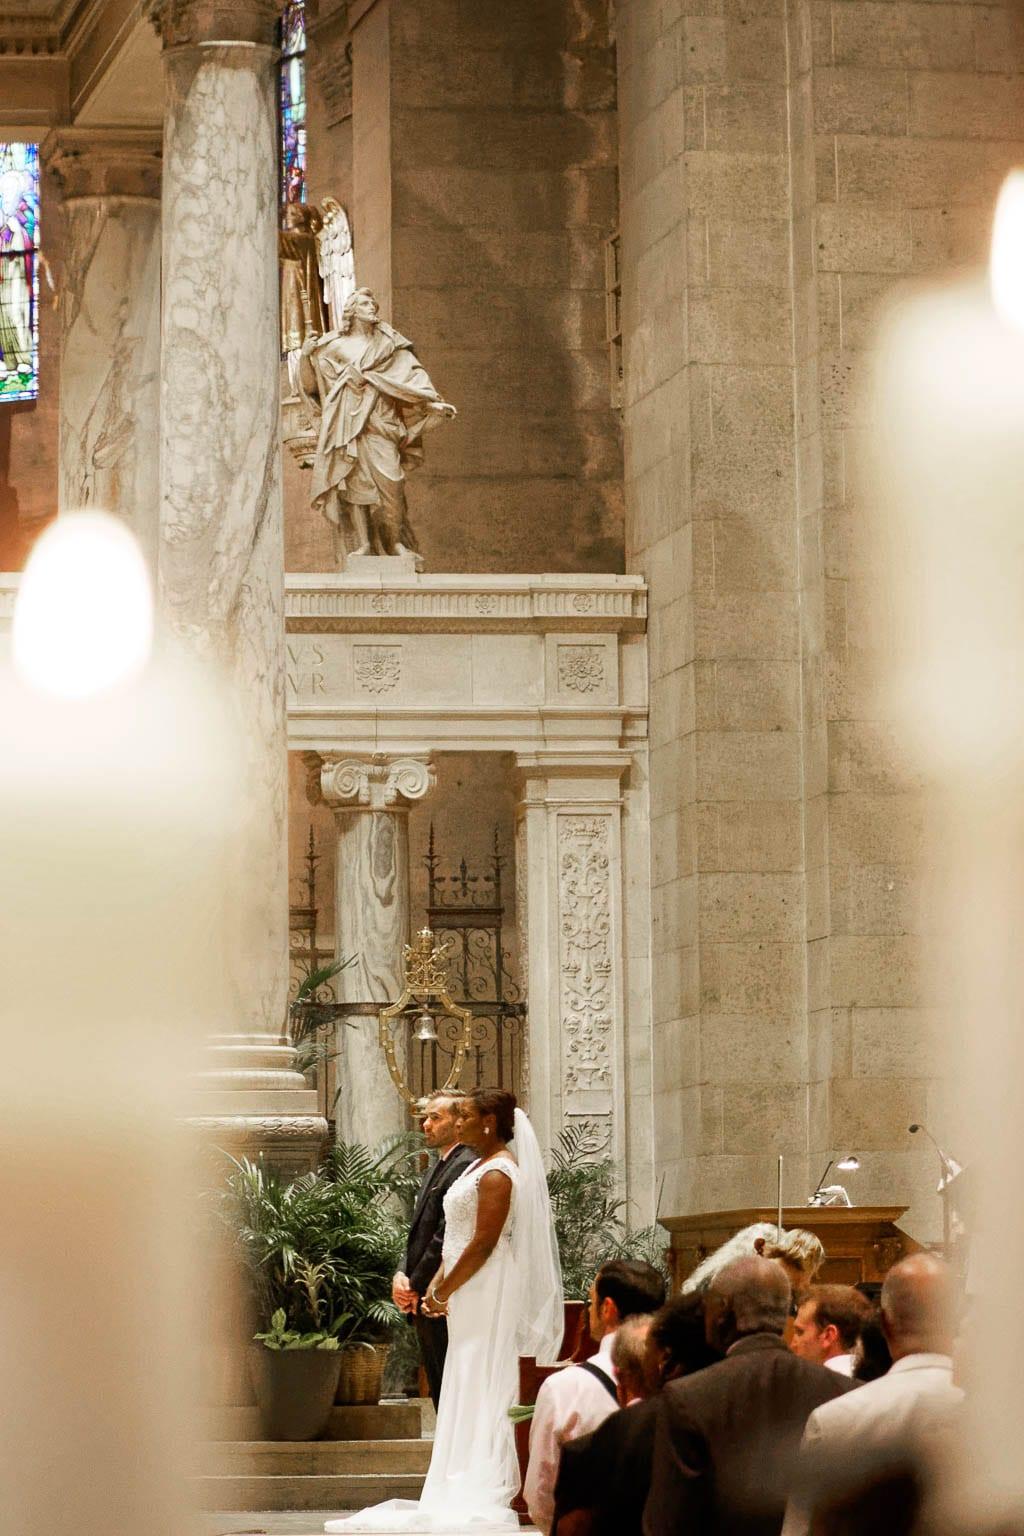 basilica of saint mary 16